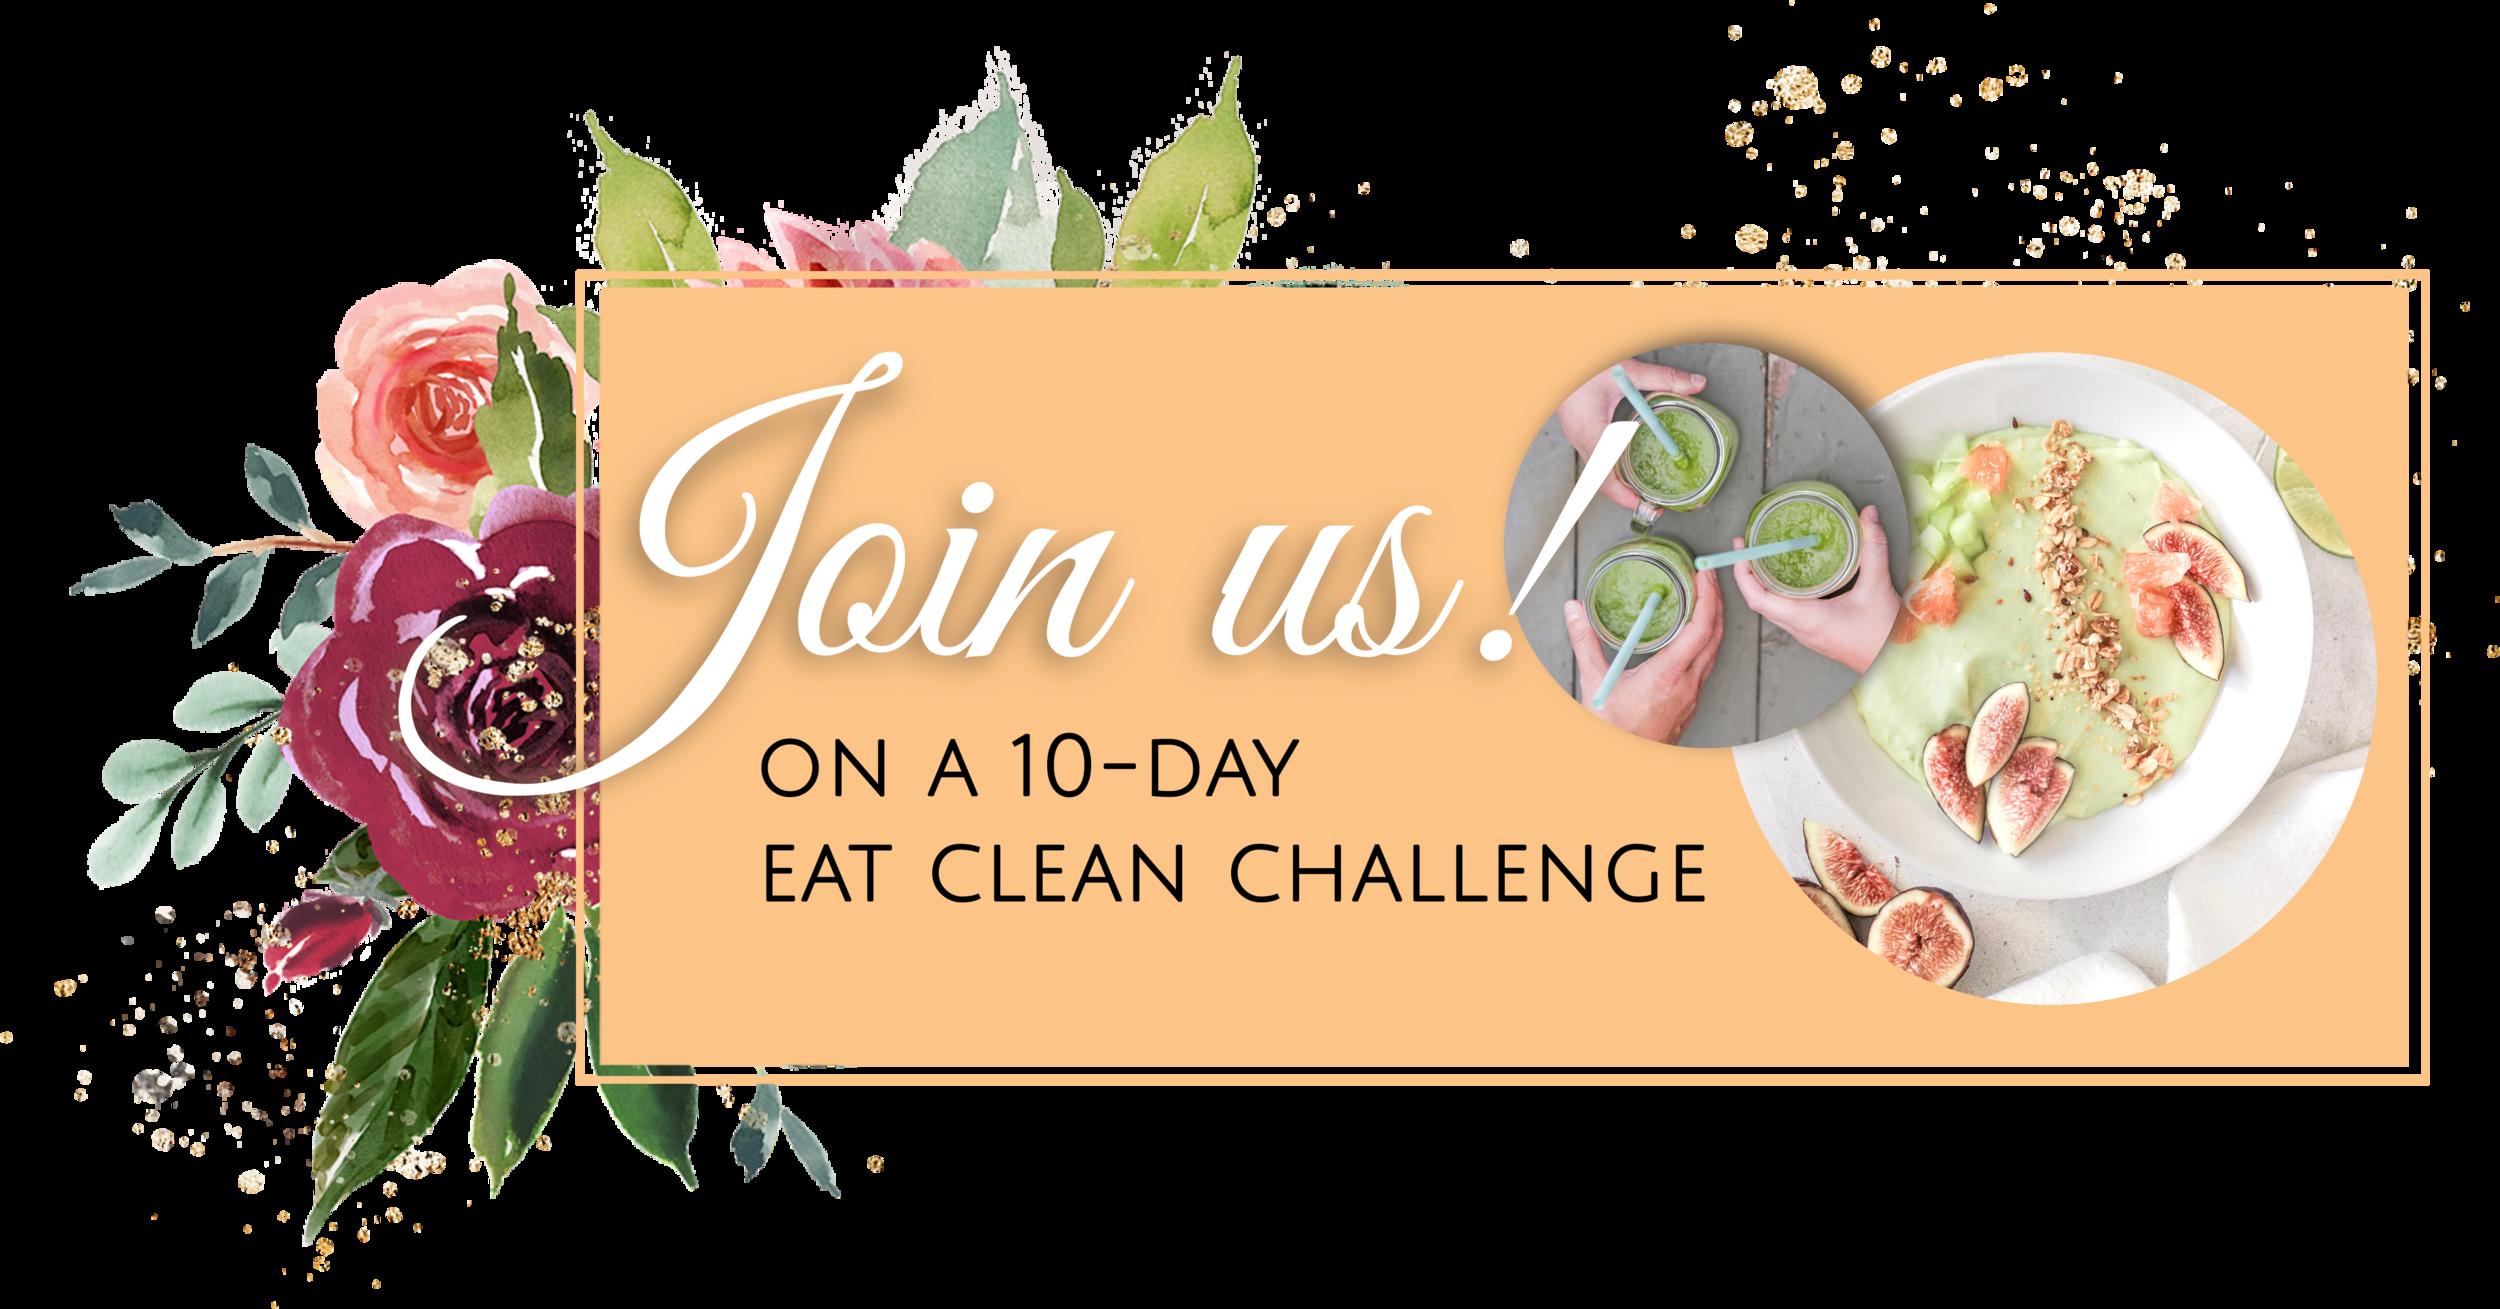 casey.eat-clean-challenge.banner.png